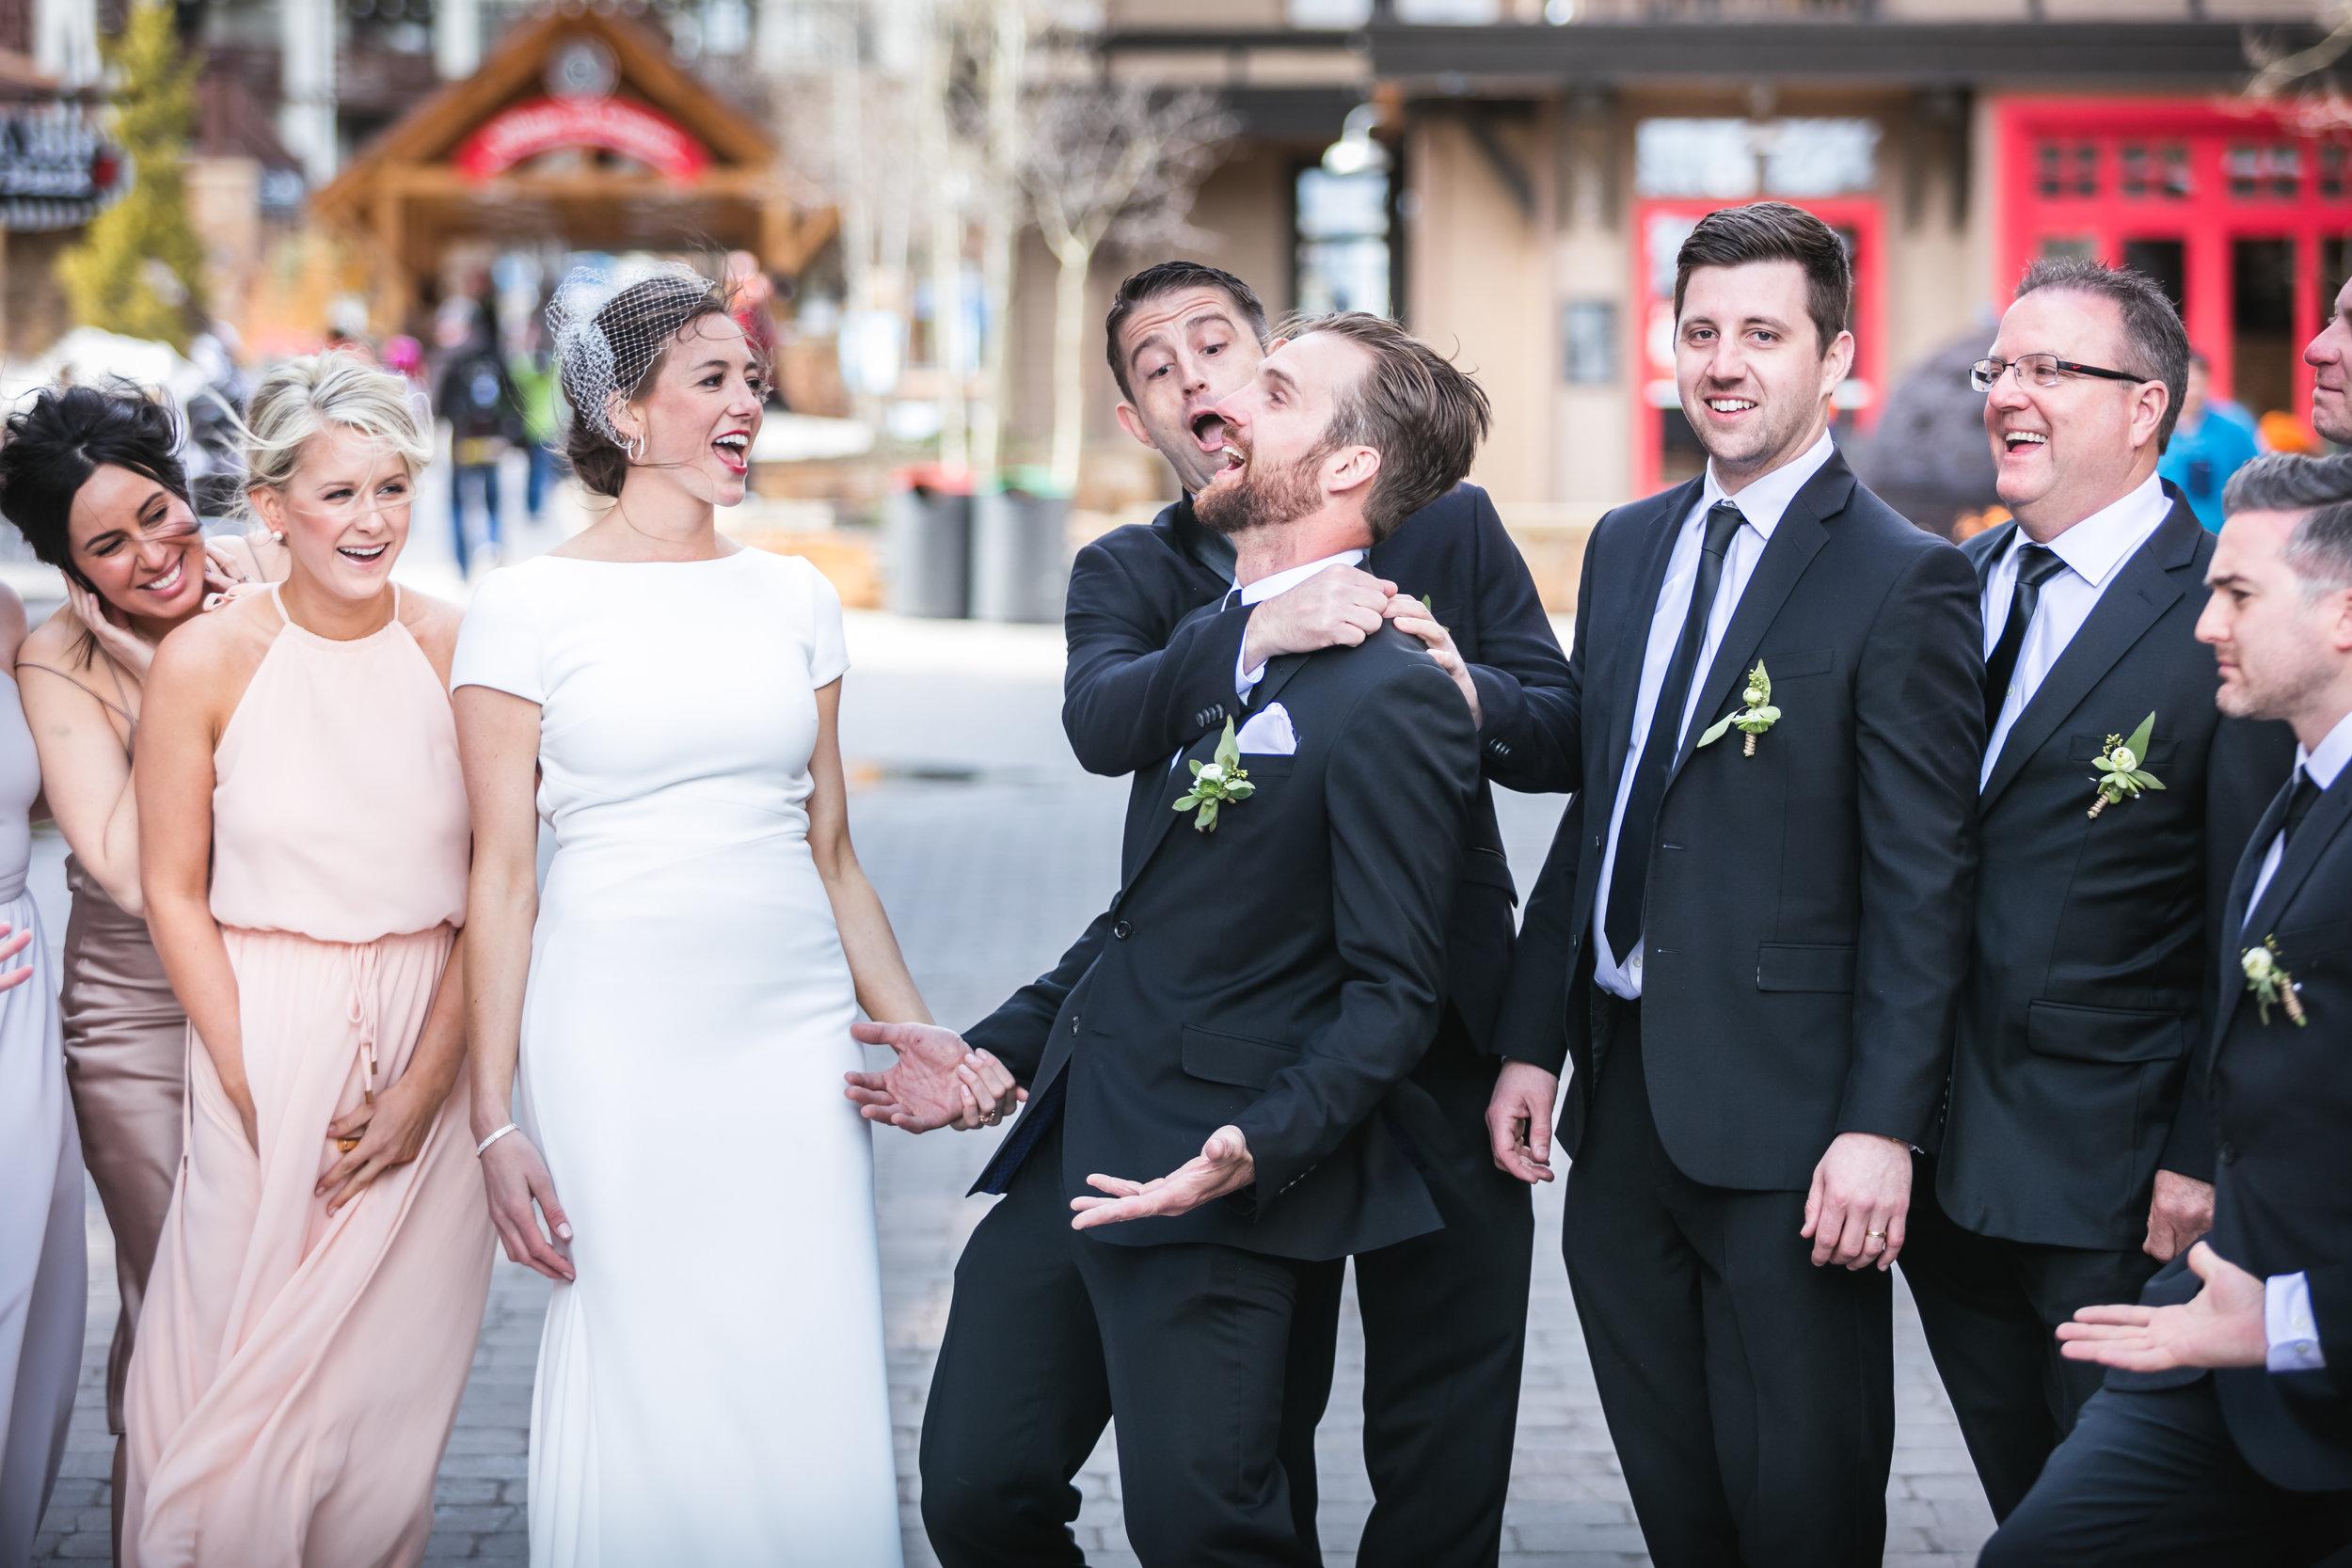 vild-photography-photographer-colorado-intimate-wedding-adventure-Stephanie- Adam-437.jpg